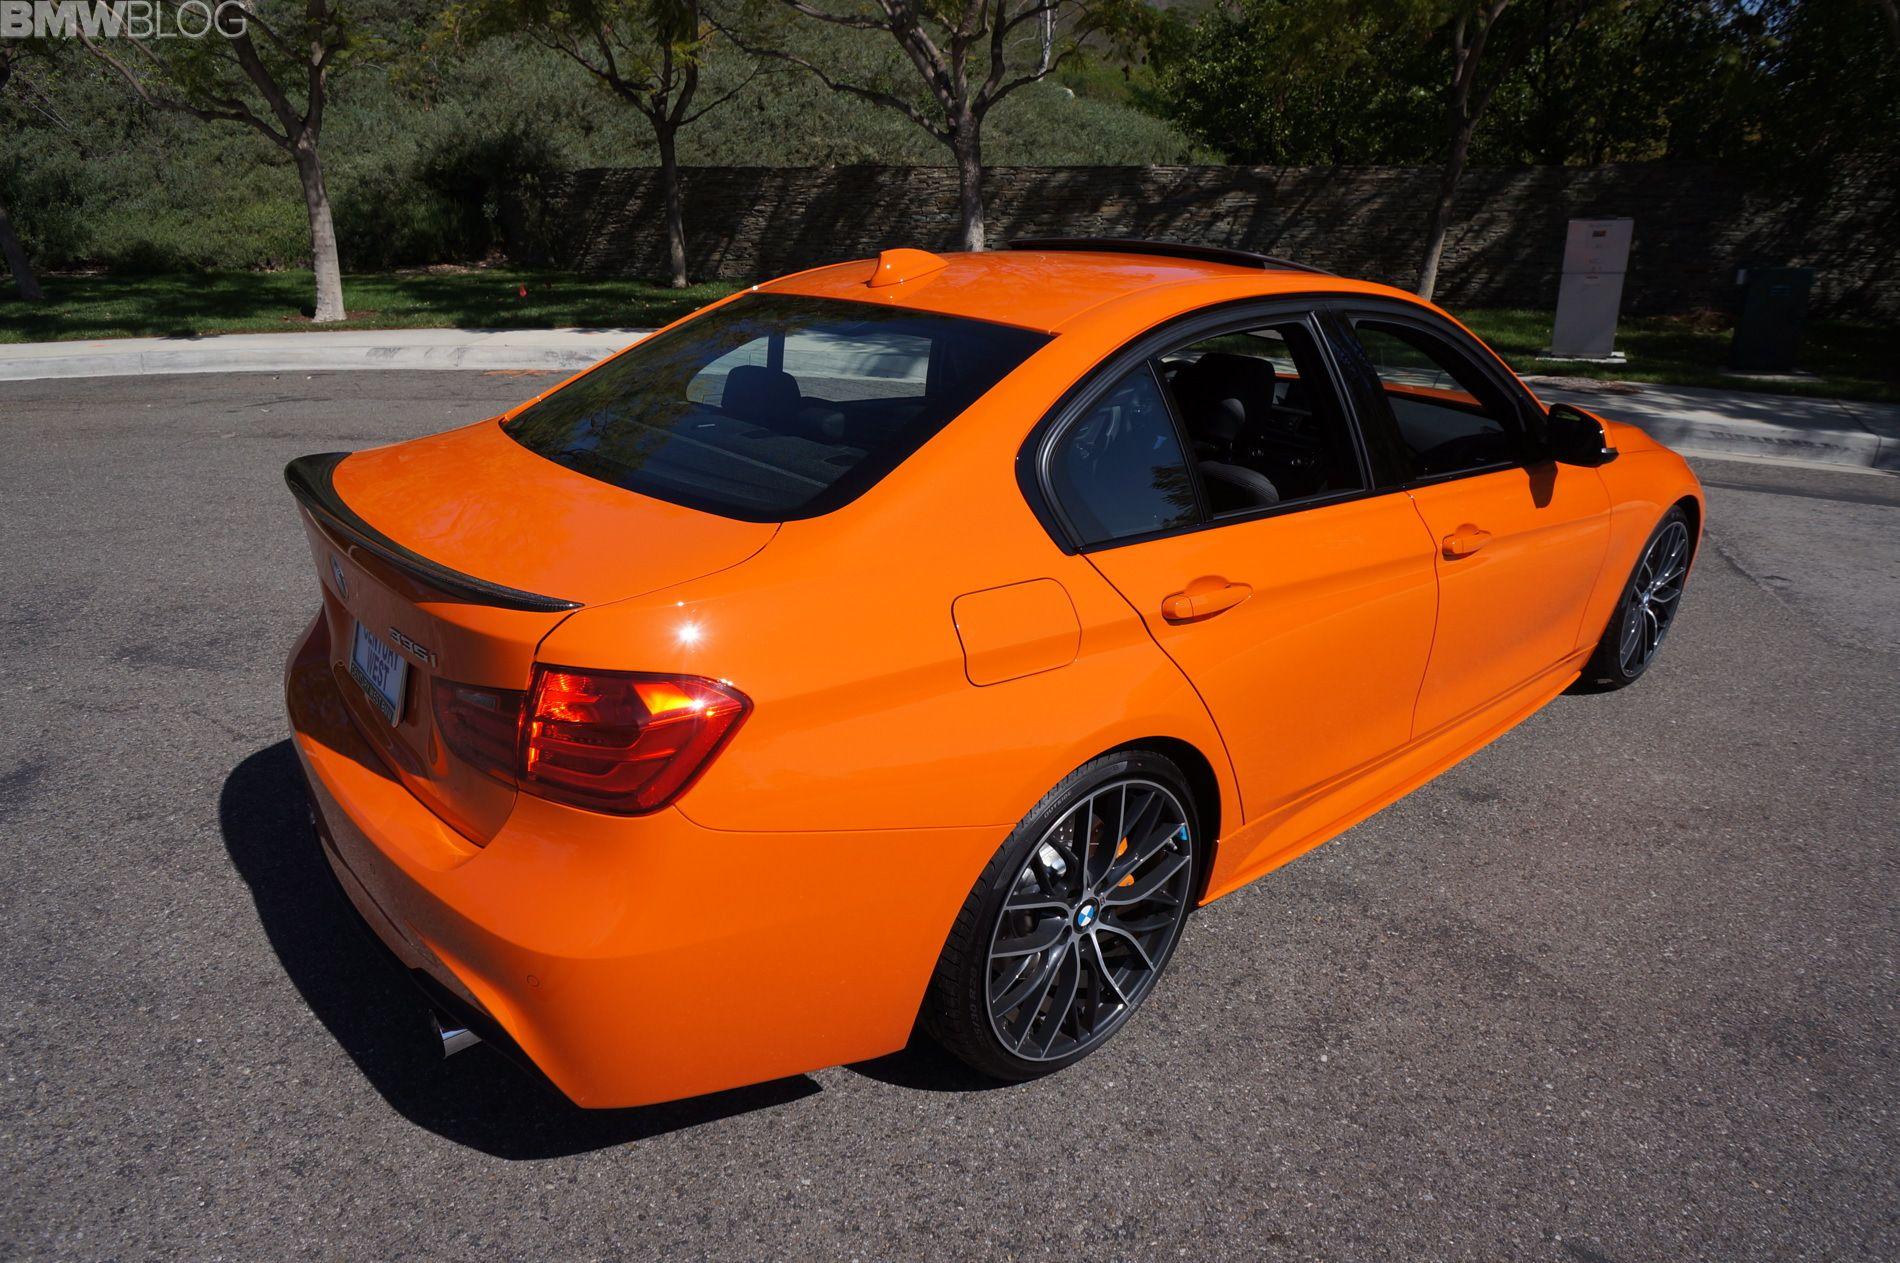 fire orange bmw 335i with manual transmission whip edm bmw rh pinterest com 335i manual swap 335i manual sedan for sale